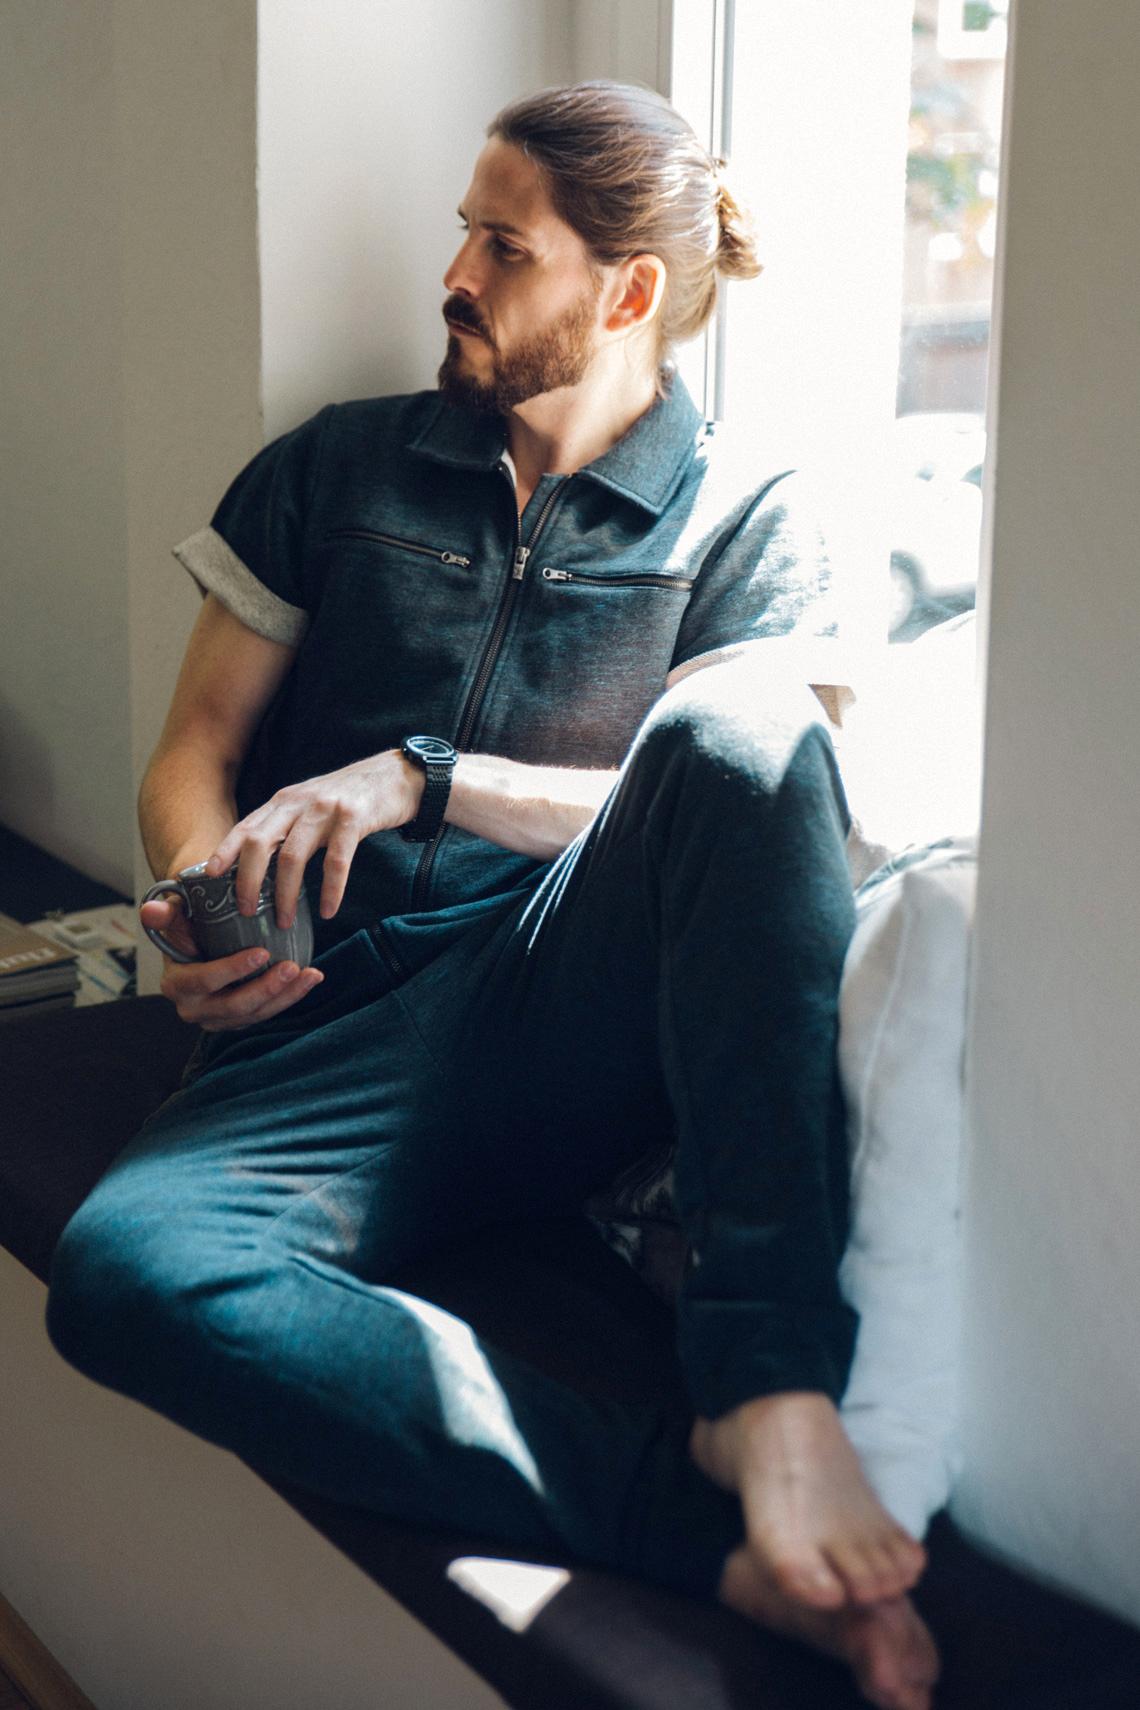 Fashionblog-fuer-Maenner-Kaisers-neue-Kleider-Trend-Onepiece-Overall-Accessoires-Slow-Watch